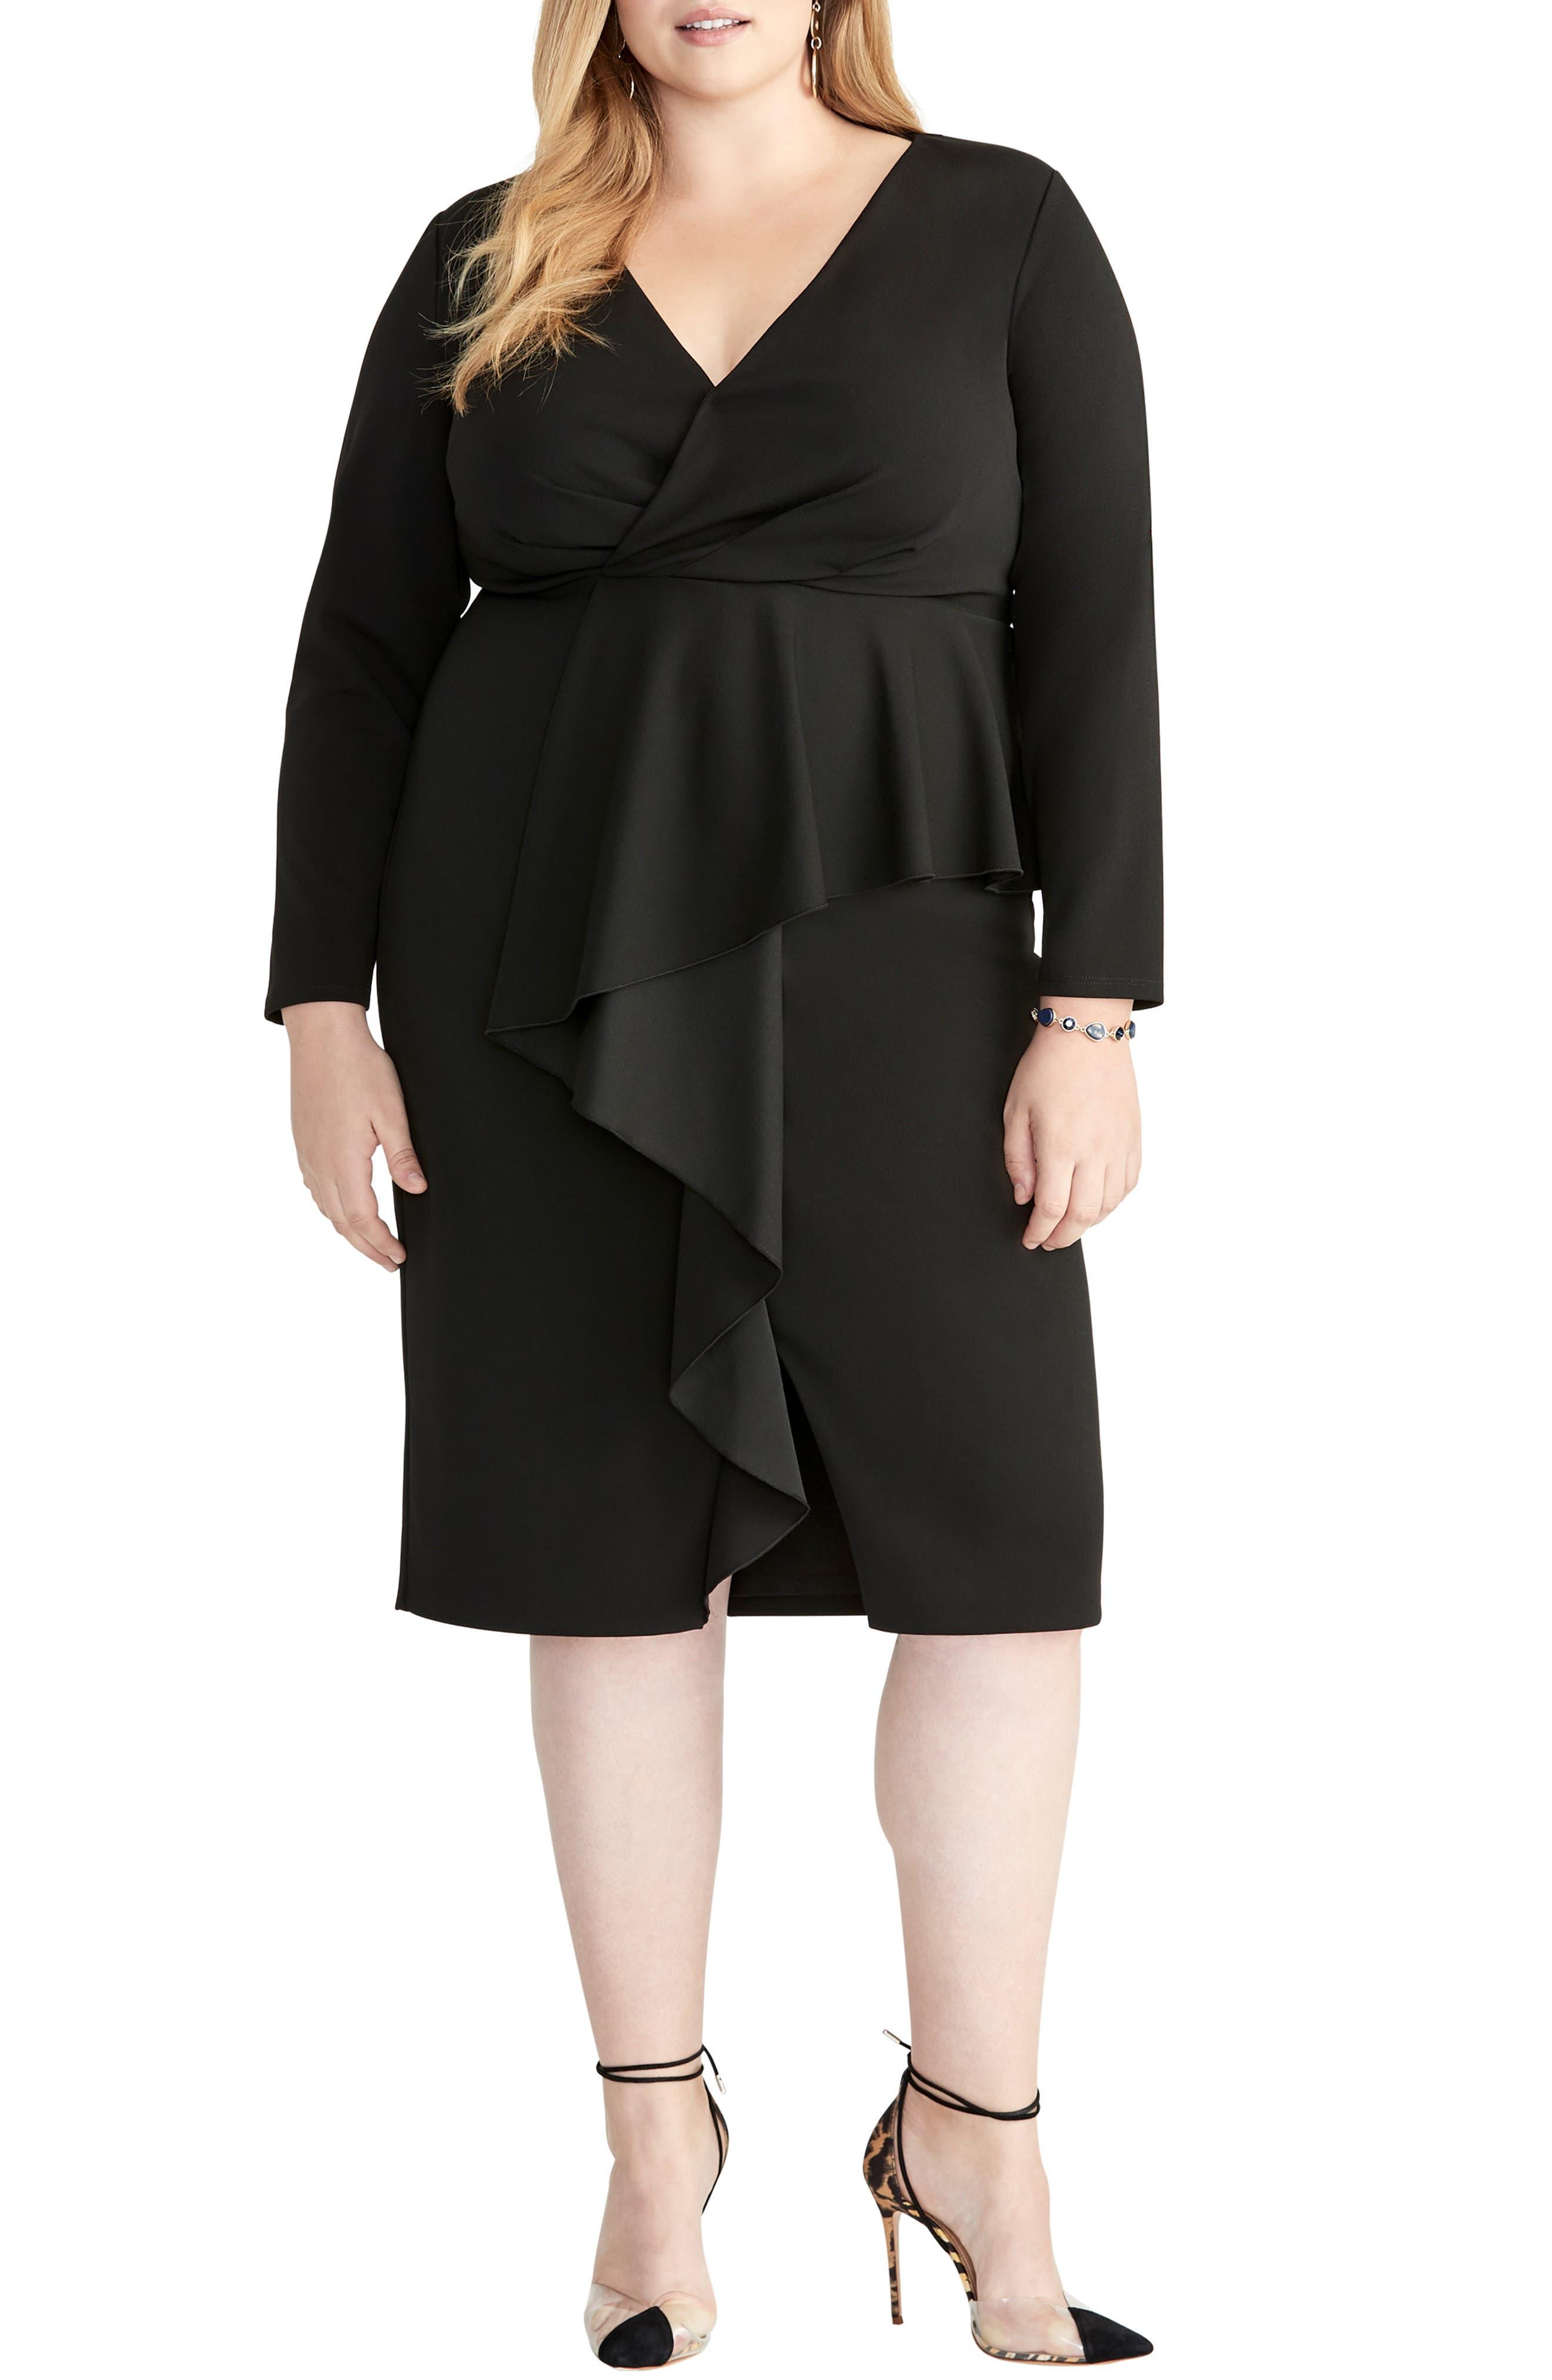 Plus Size Rachel Rachel Roy Ruffle Front Faux Wrap Dress, Black